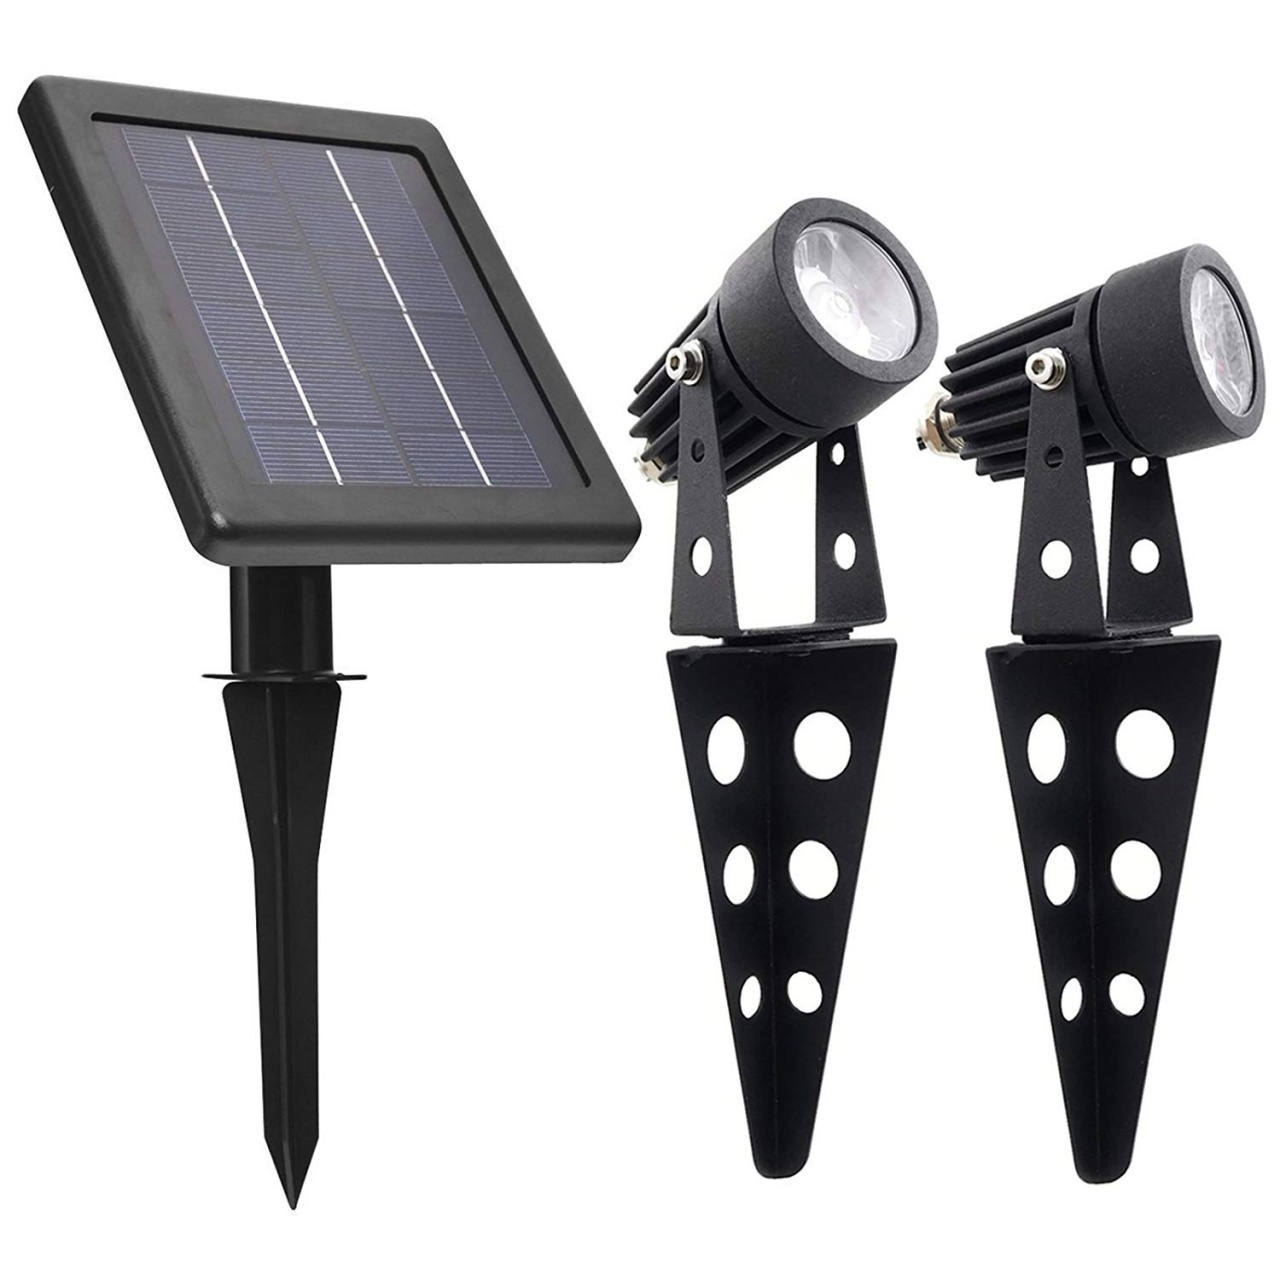 solar lights for vinyl fence posts solar light mart mini 50x twin solarbetriebener aluguss led strahler warmweis 60 100 lumen pro beleuchtungseinheit zur ausenbereichs garten from solar ligh